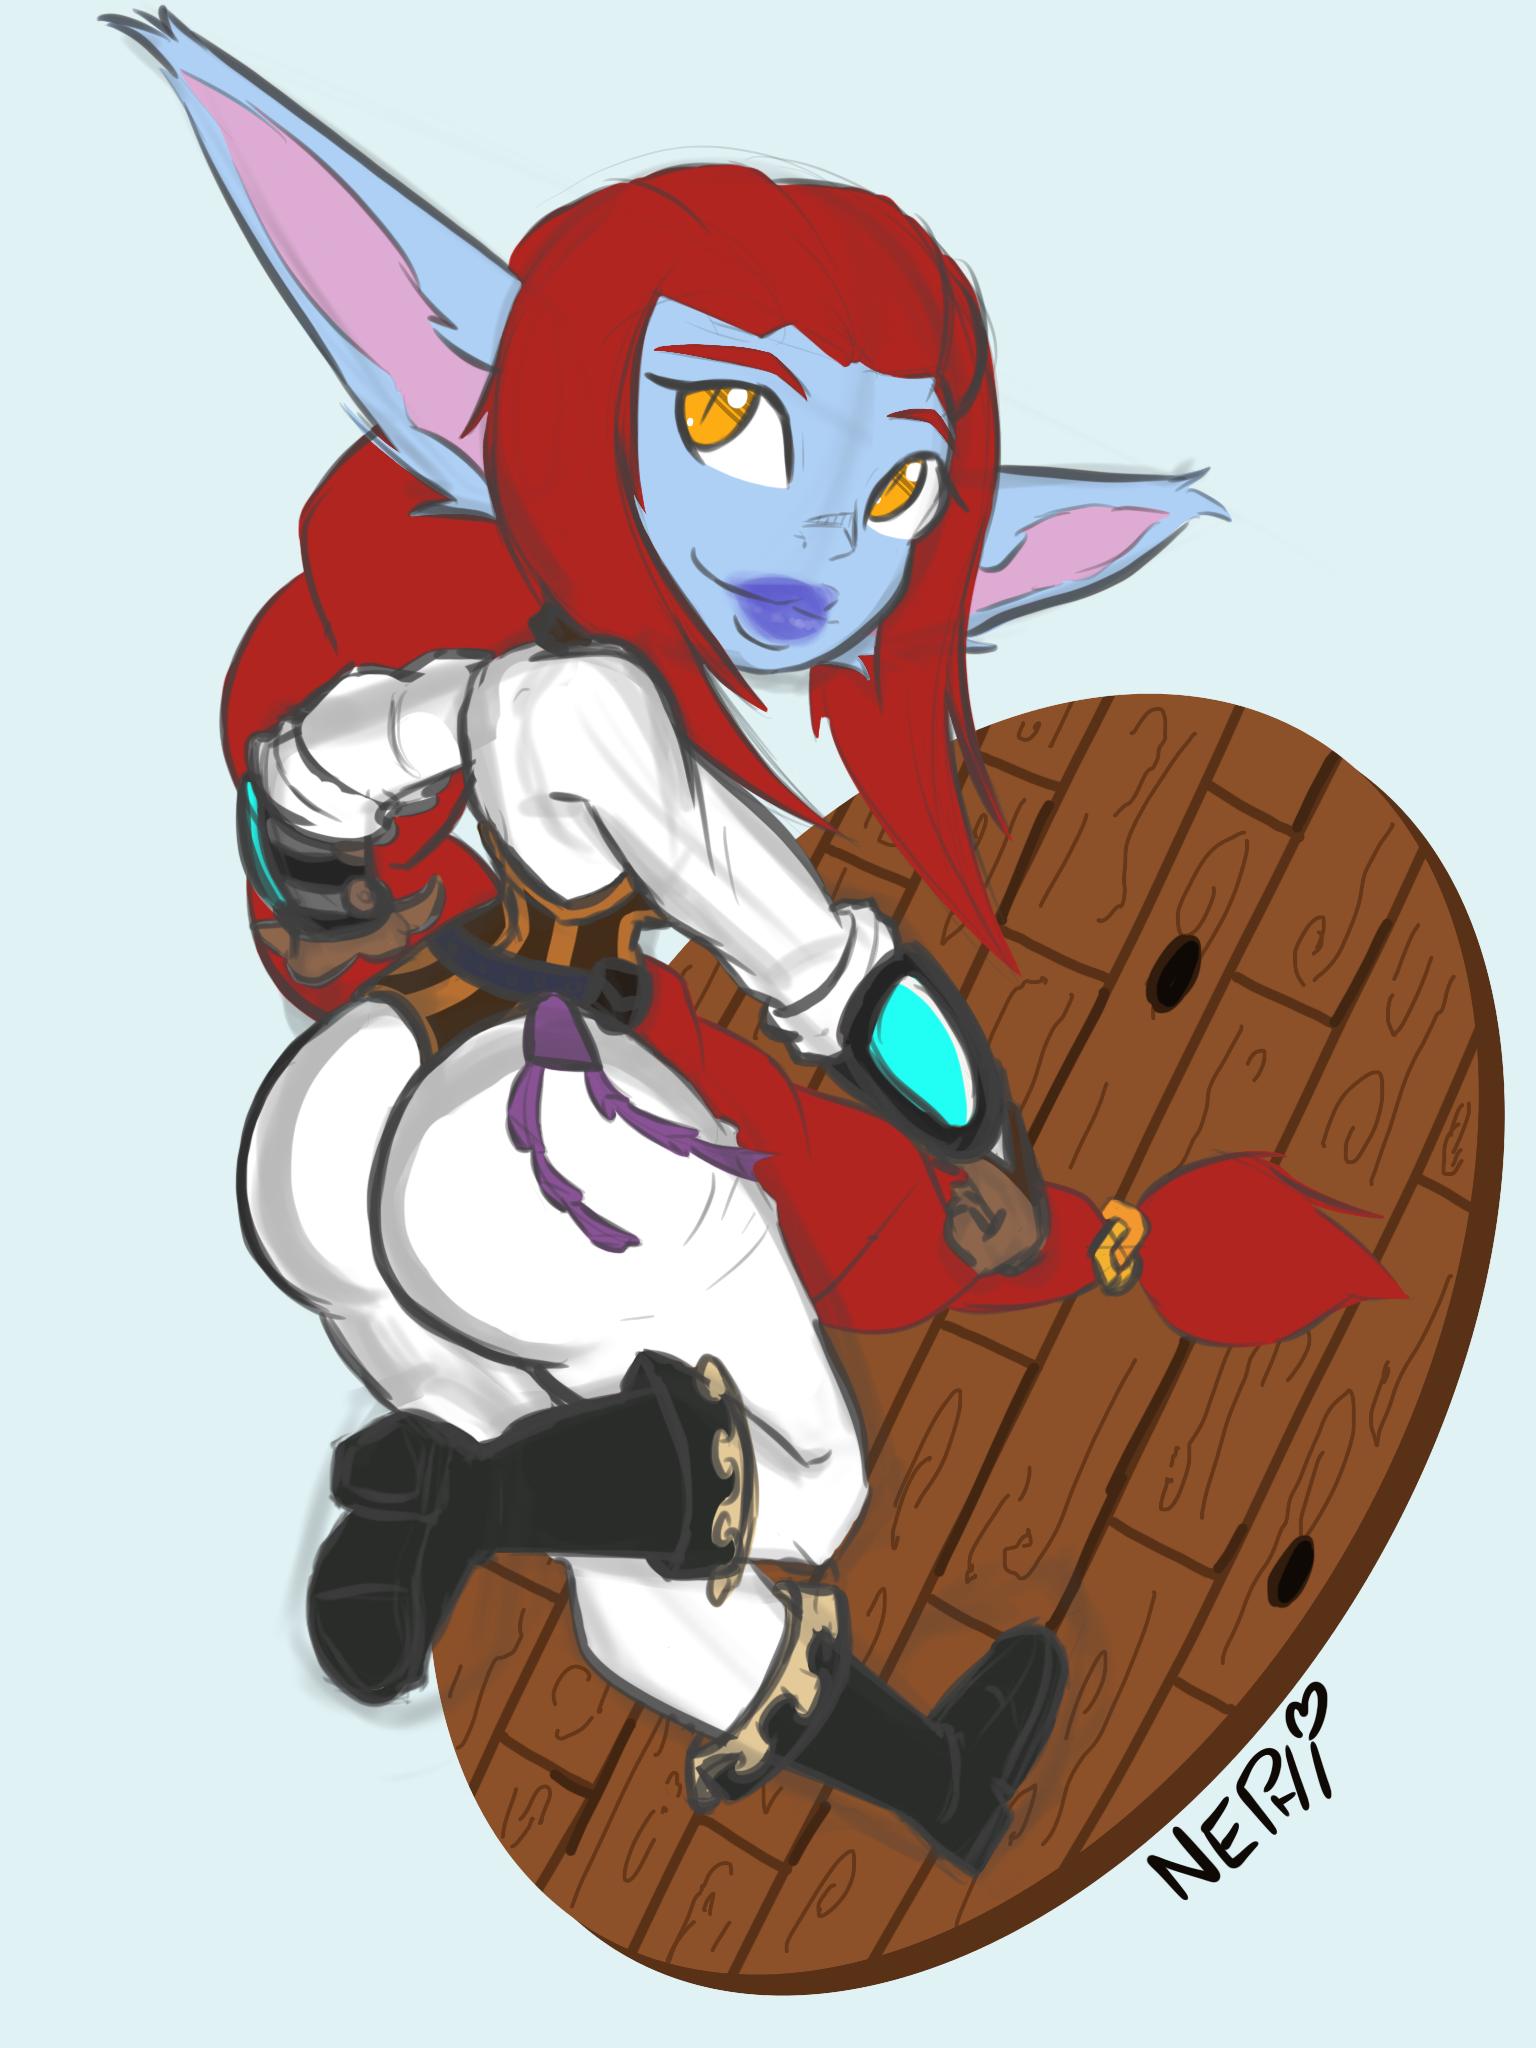 Pirate Yordle